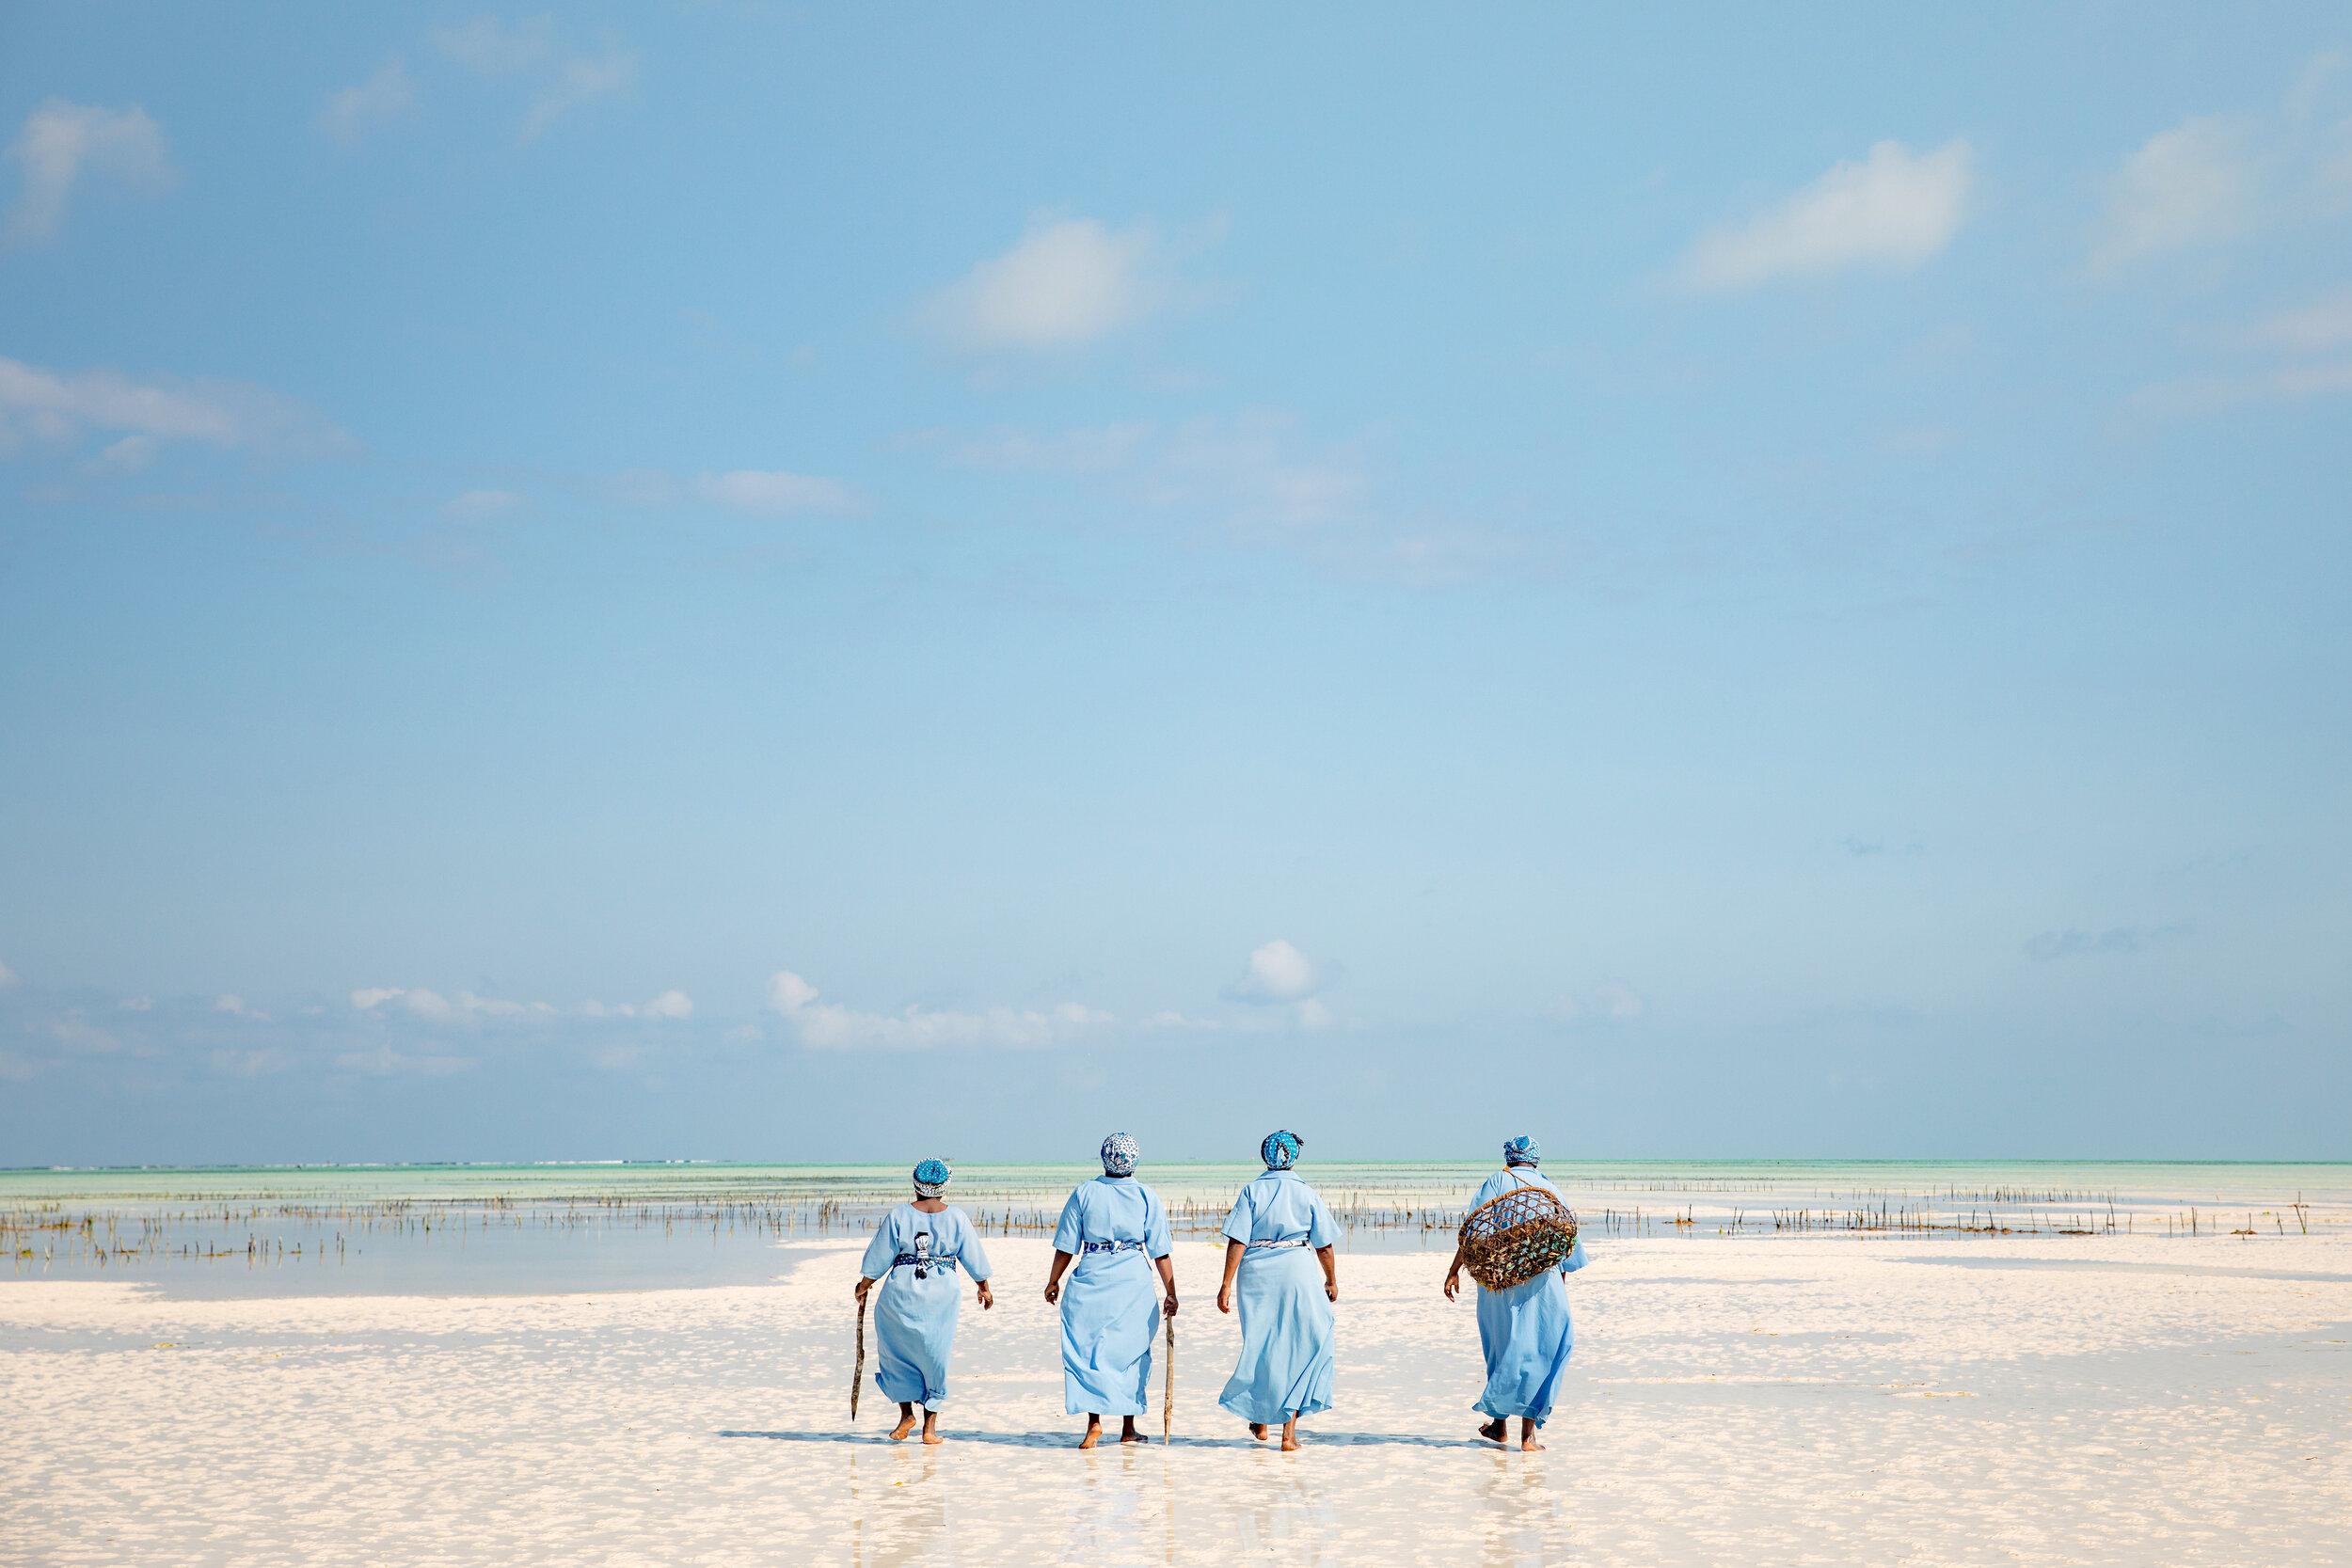 APitts_Condor_Zanzibar_097-2.jpg